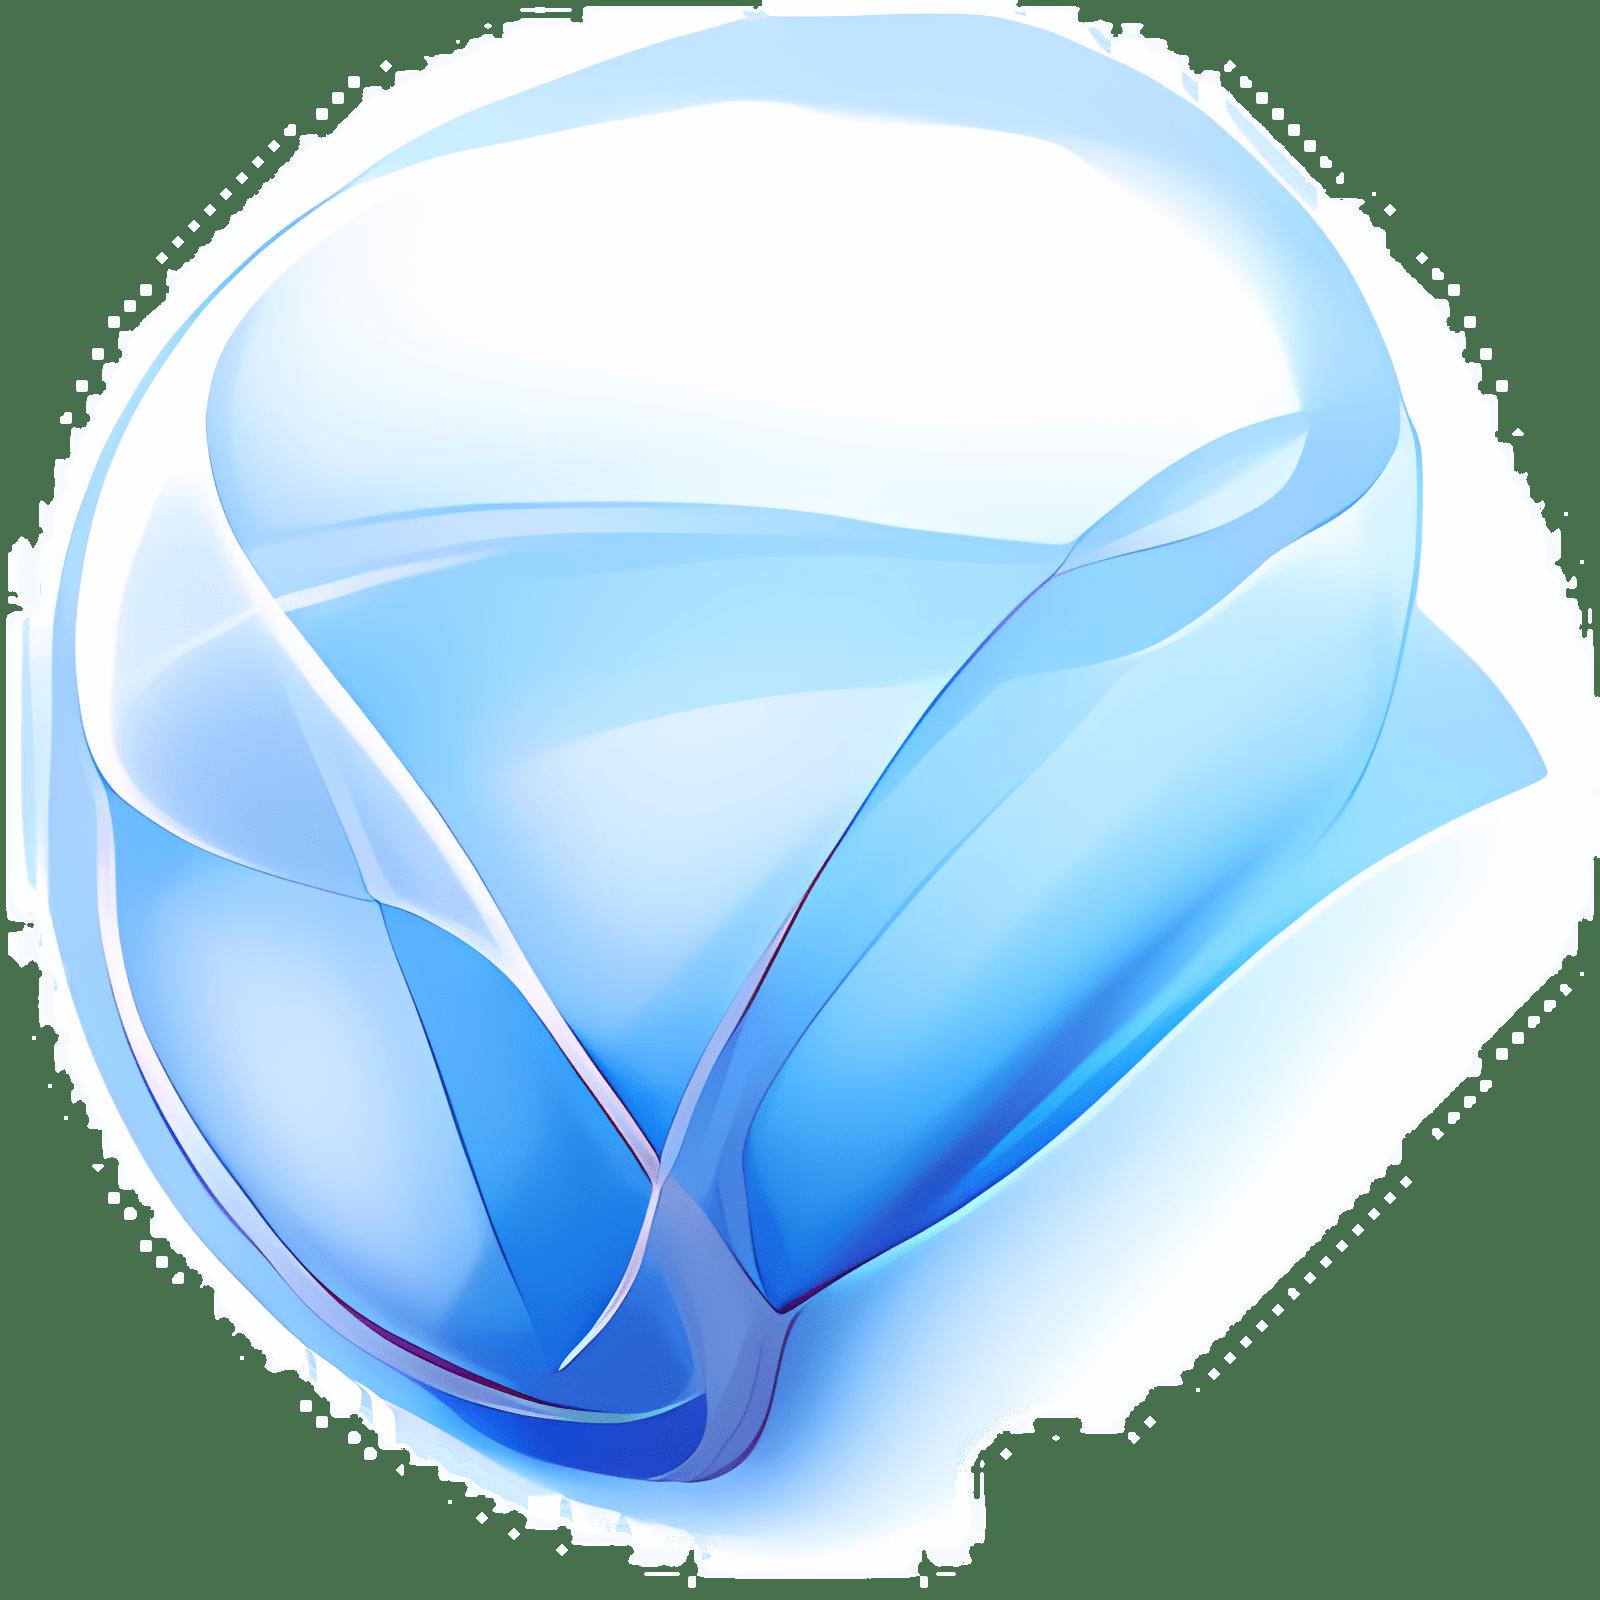 Microsoft Silverlight 5.1.20125.0